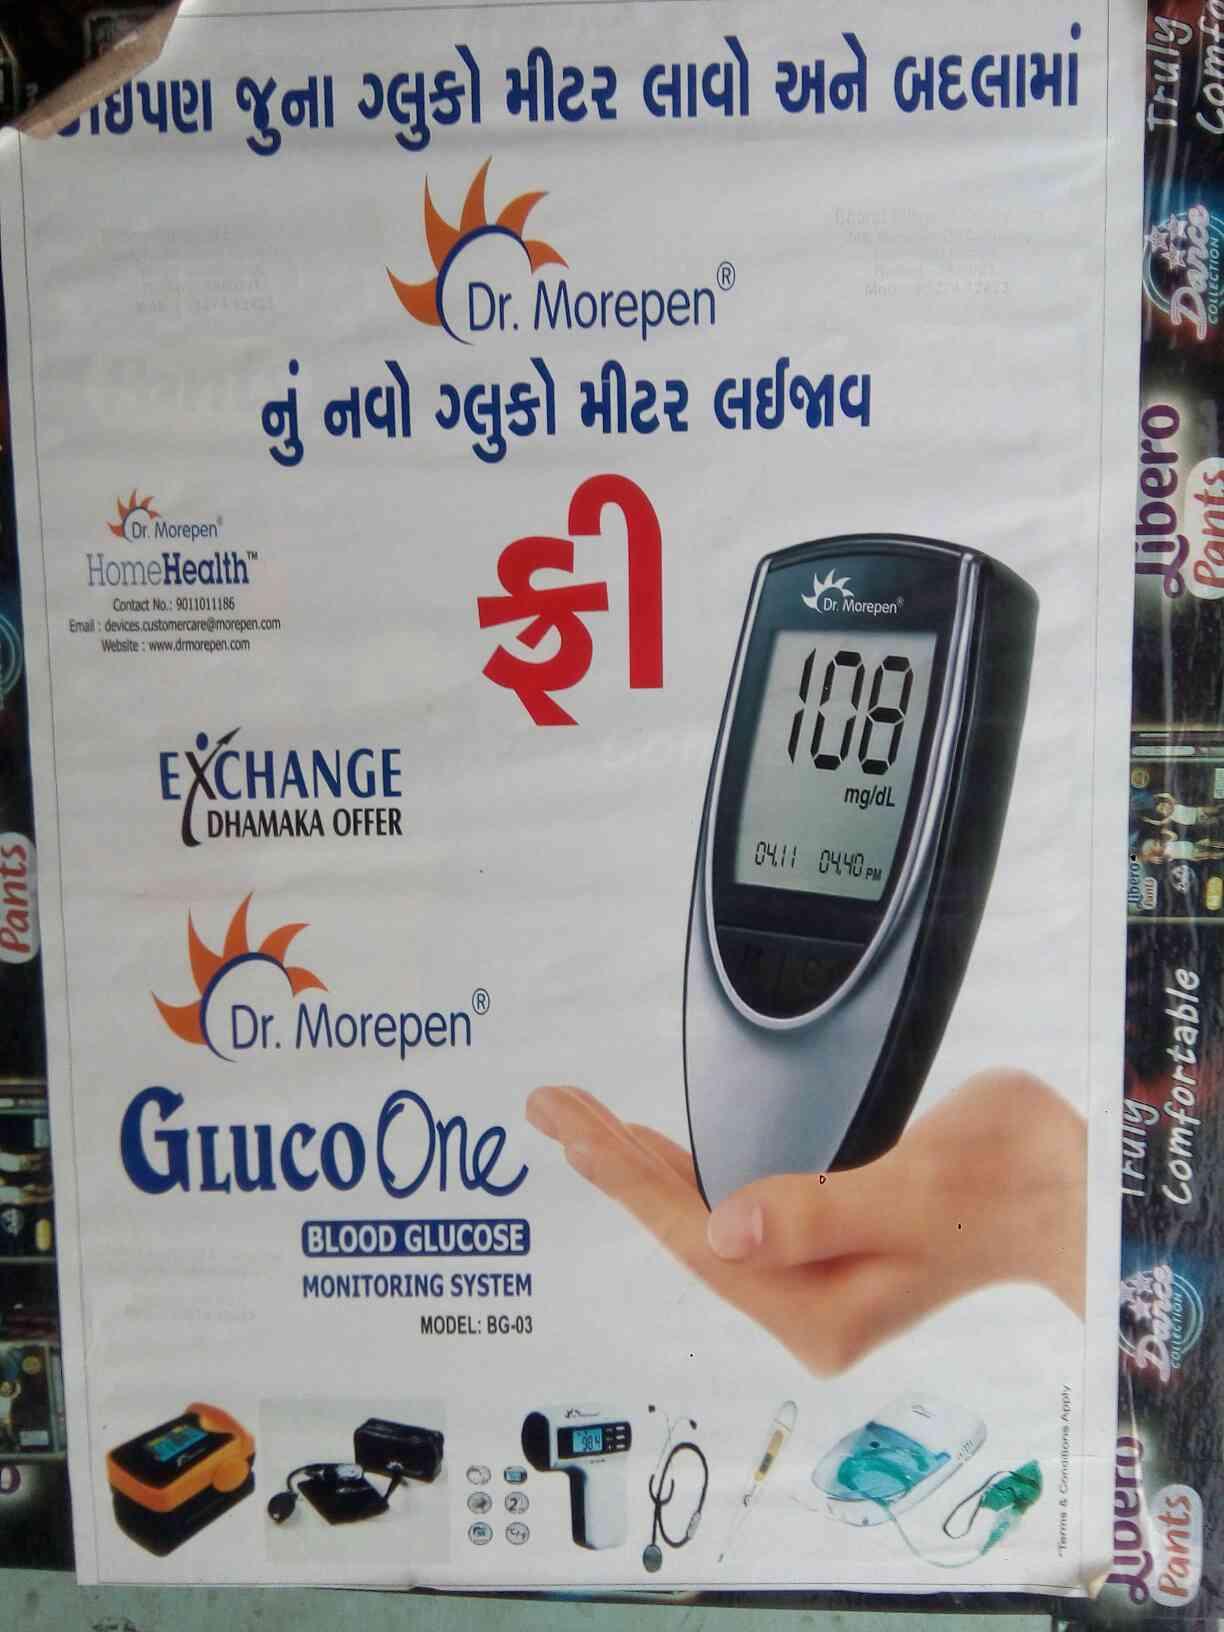 We Bharat Surgical Enterprise is Leading Supplier of Best Quality Blood Glucose Monitoring System in Rajkot. Our Network Spread in Morbi, Jamnagar, Porbandar